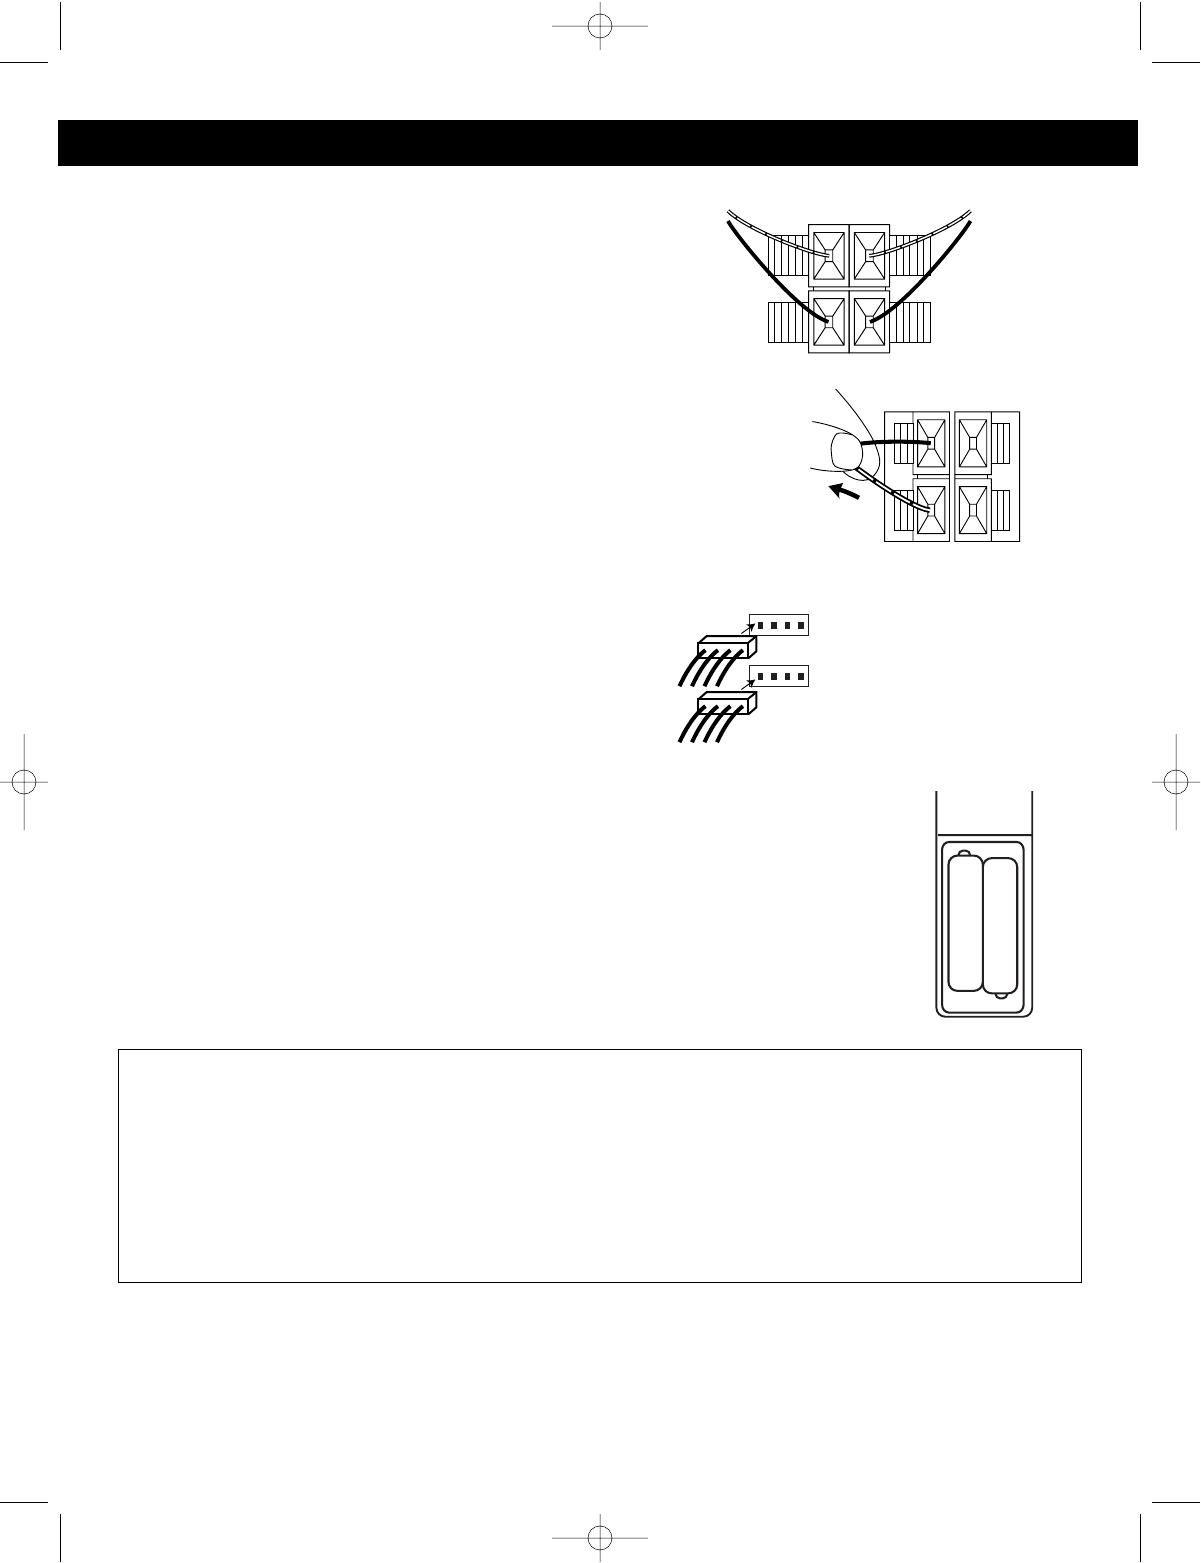 Scintillating memorex wiring diagram images best image wire